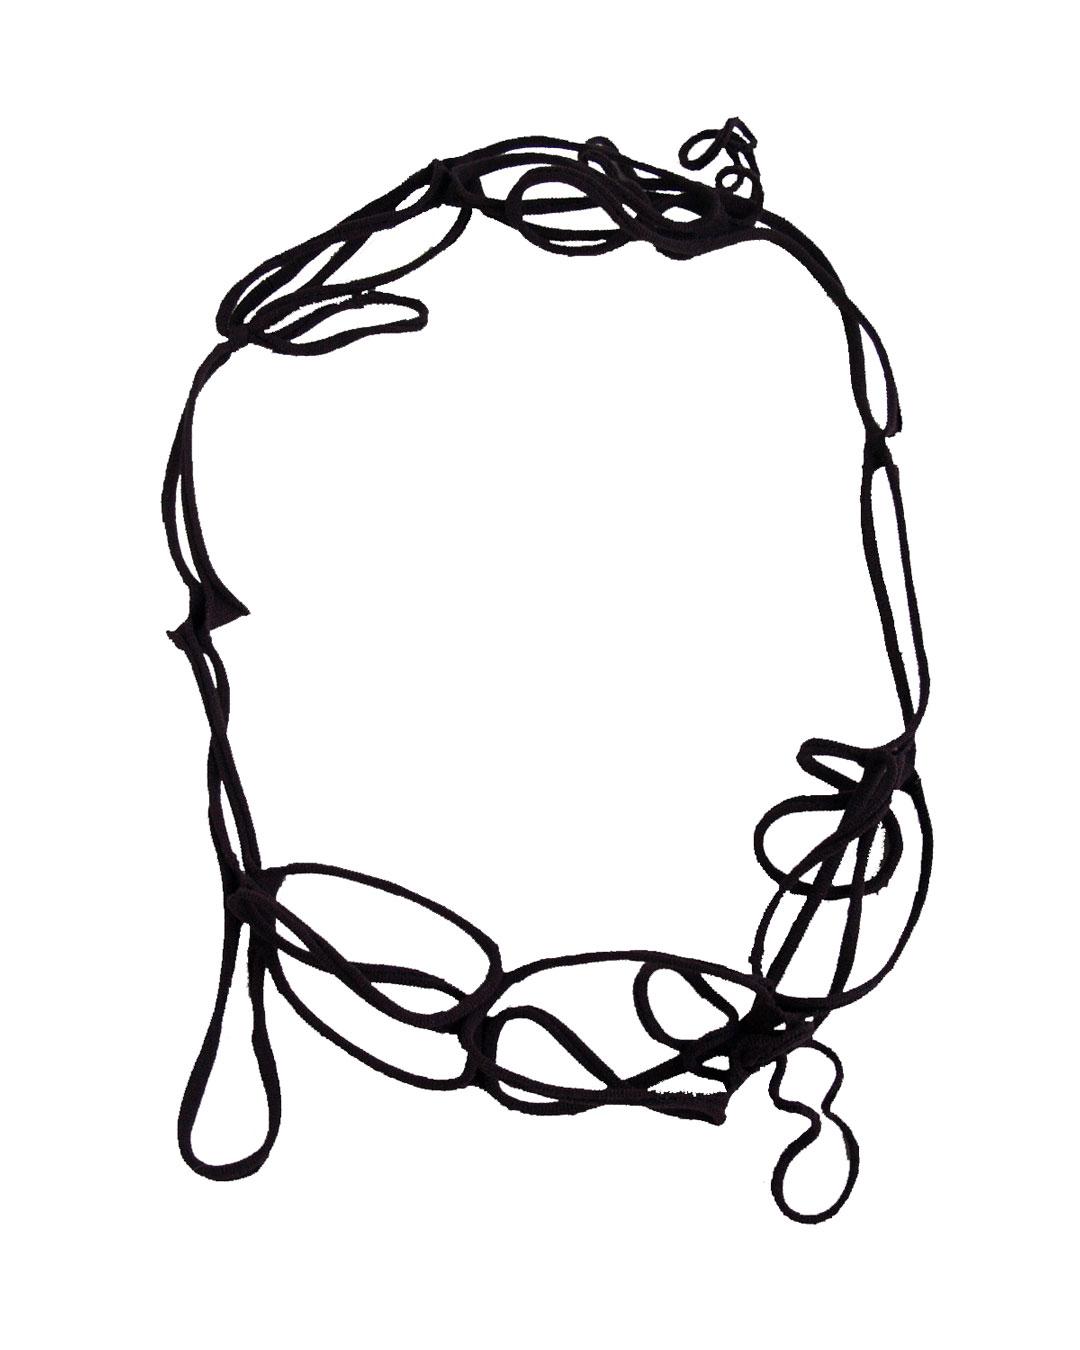 Mirei Takeuchi, untitled, 2008, necklace; nylon stockings, 470 x 37 x 6 mm, €185